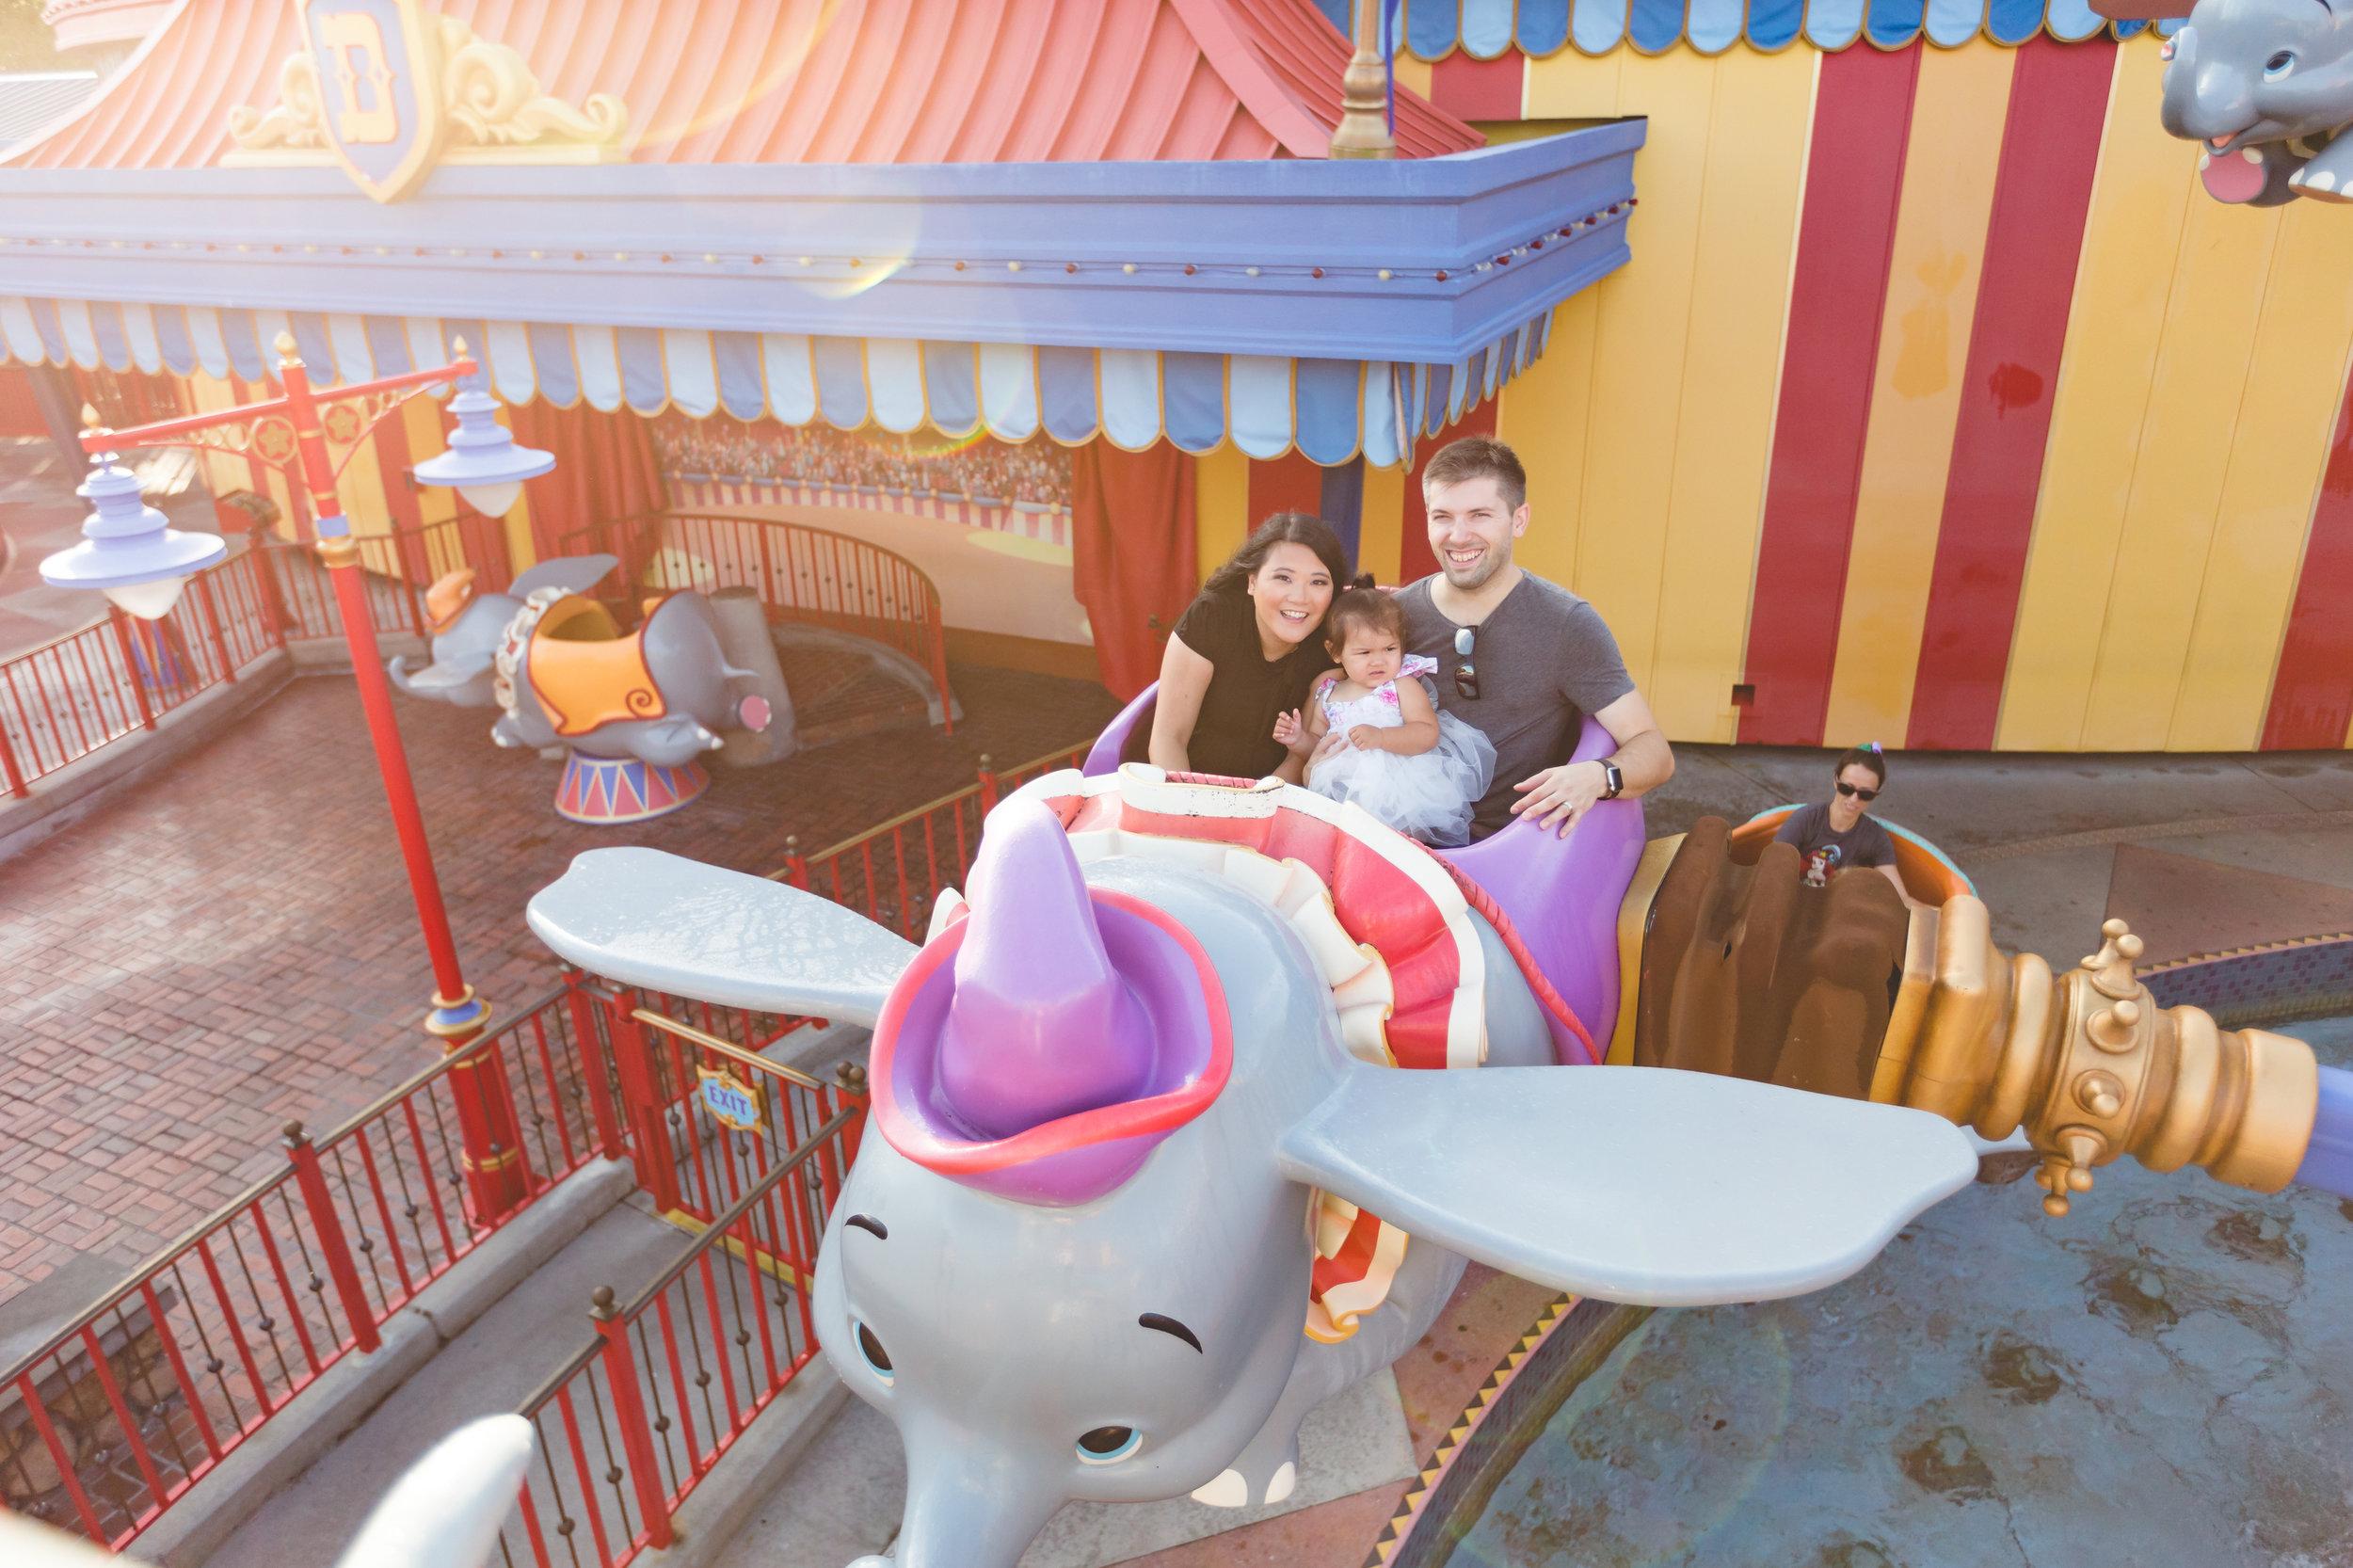 Jaime DiOrio - Disney World Family Photo - Orlando Family Photographer - Orlando Engagement Photographer - Magic Kingdom Family photos - Epcot Family photos 22.jpg